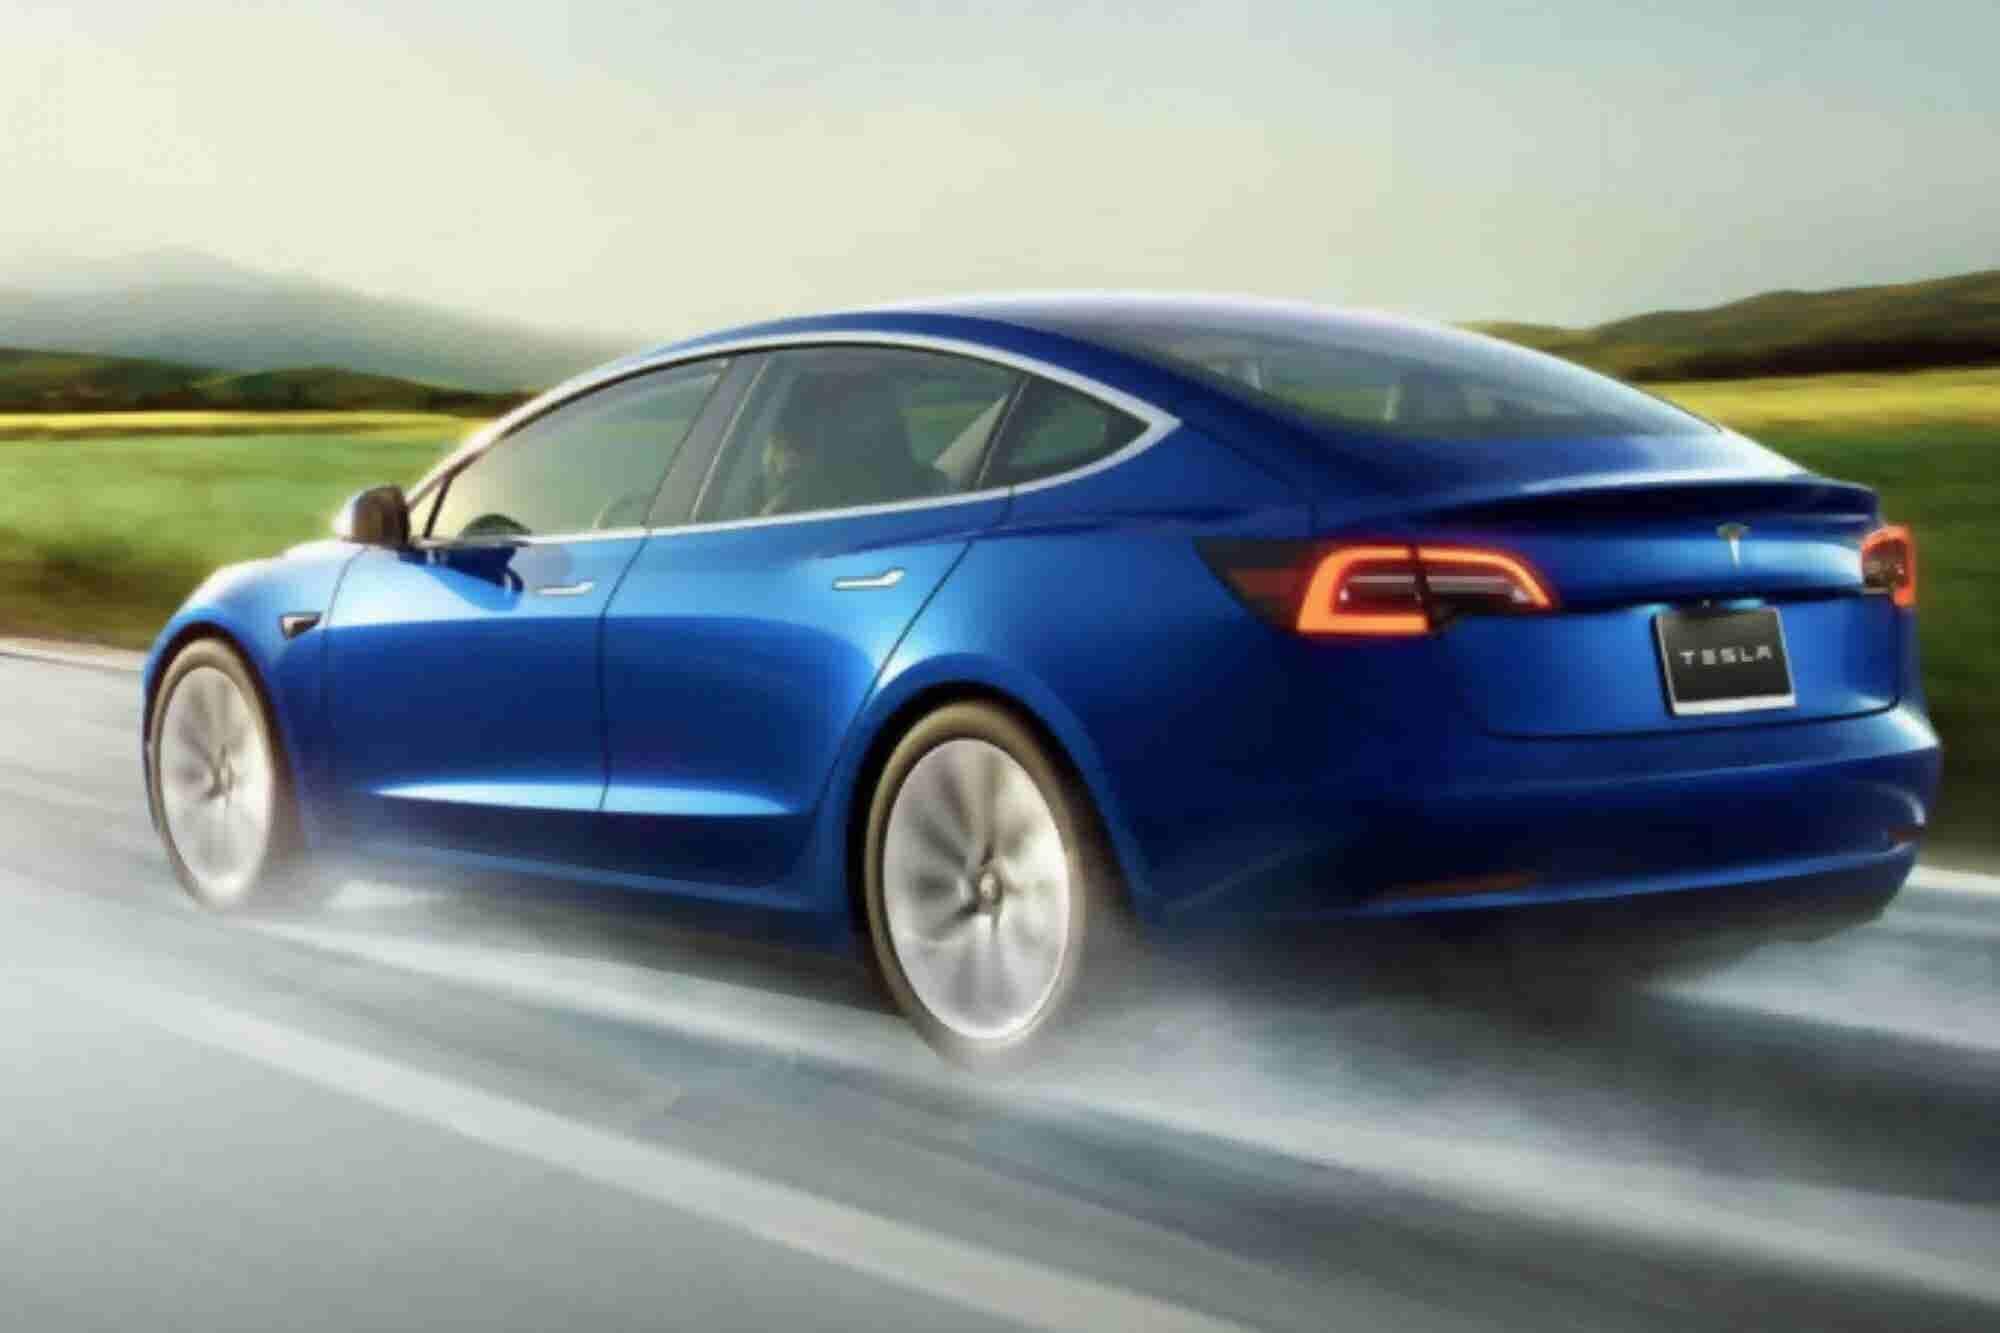 Tesla Stops Selling $35,000 Model 3 Online